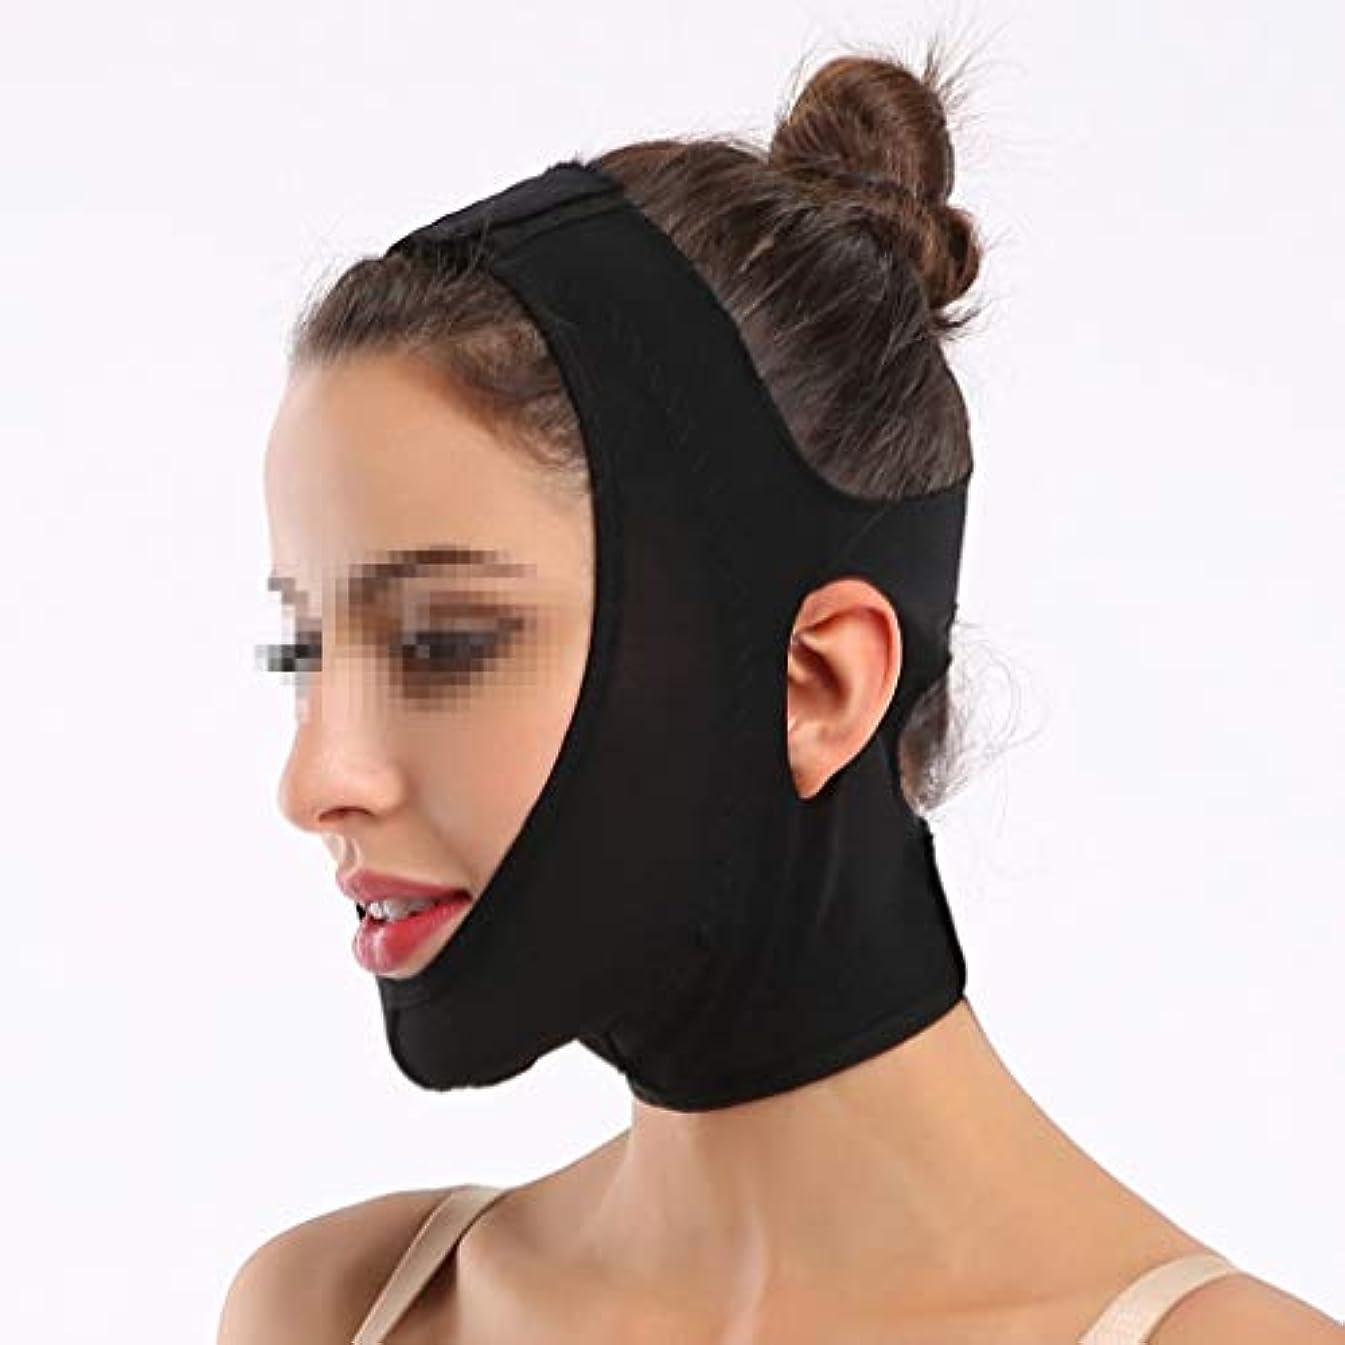 XHLMRMJ Vフェイスマスク、包帯マスクを持ち上げて引き締めるスキニービューティーサロン1日2時間Vフェイスマッサージ術後回復